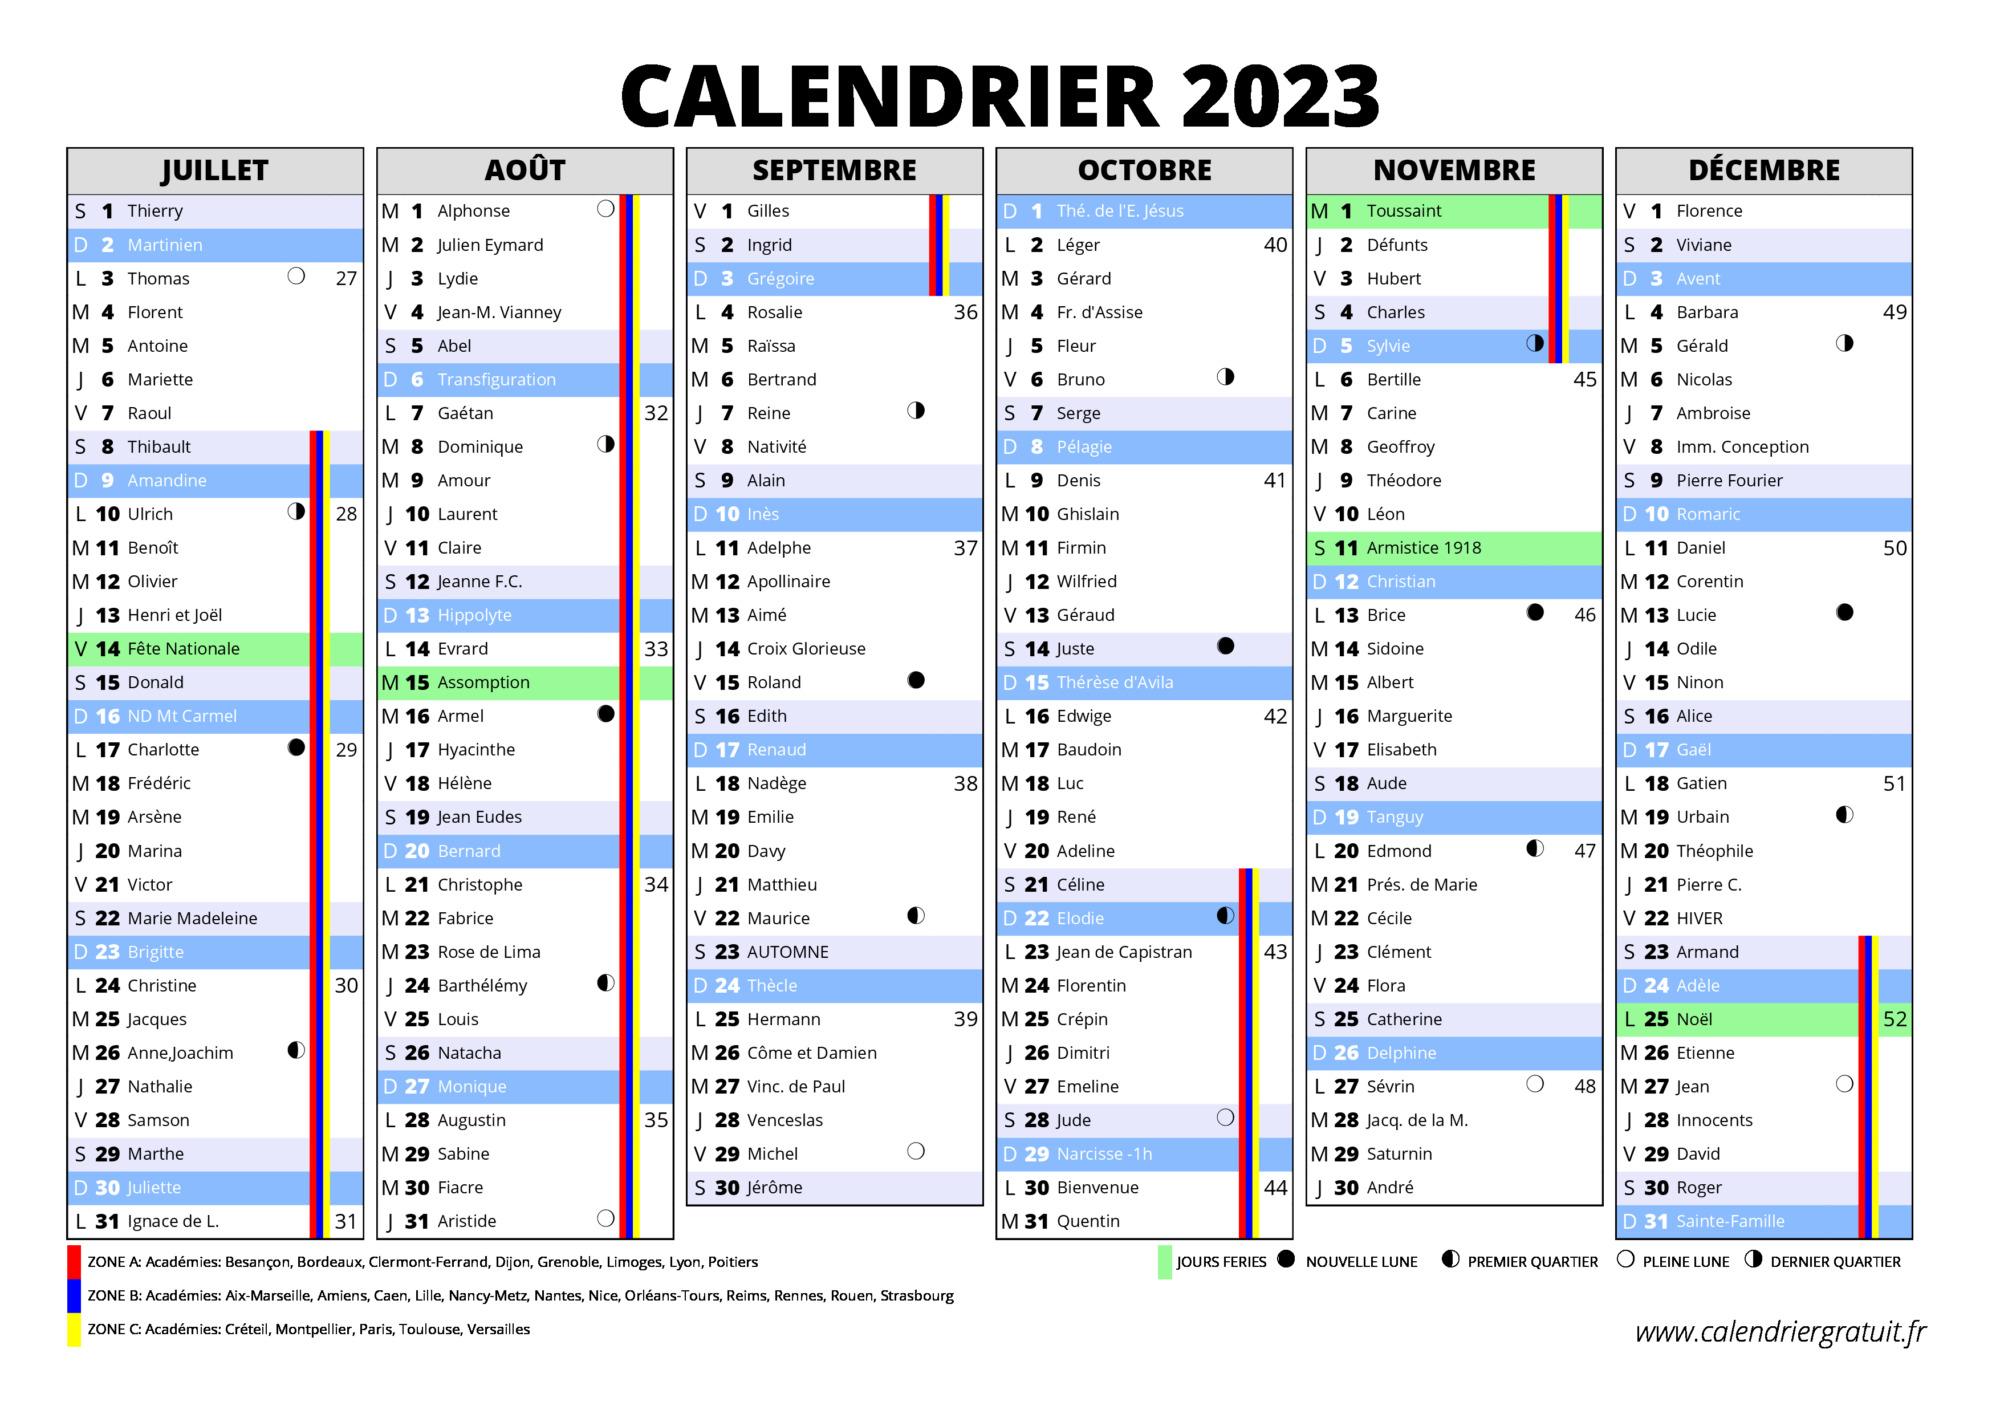 Calendrier 2022 2023 Ce1 22BET